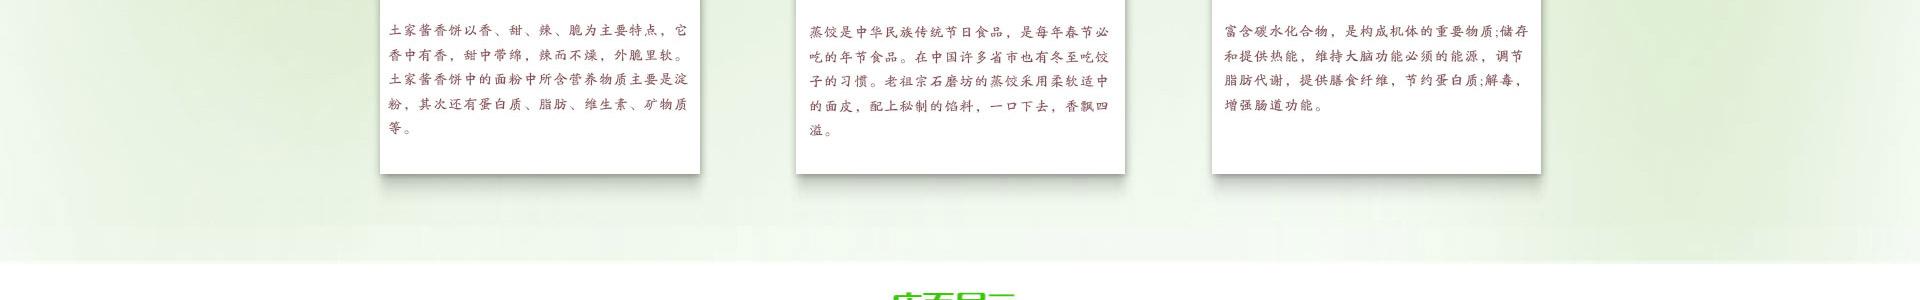 老祖宗石磨坊laozuzong_07